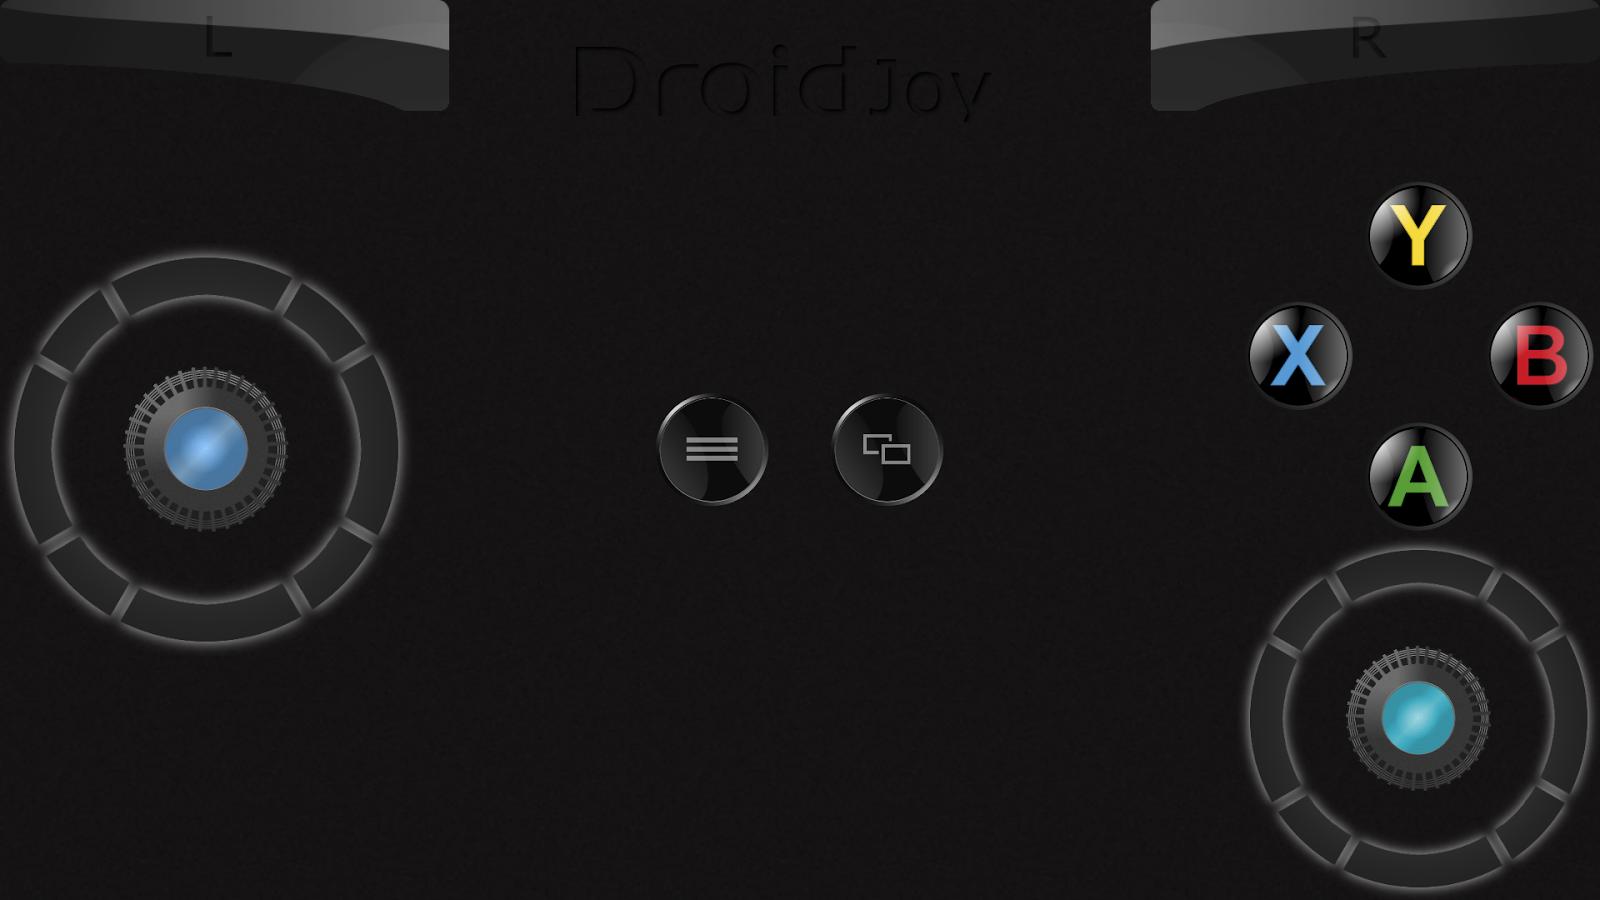 droidjoy gamepad 1 3 apk android tools apps